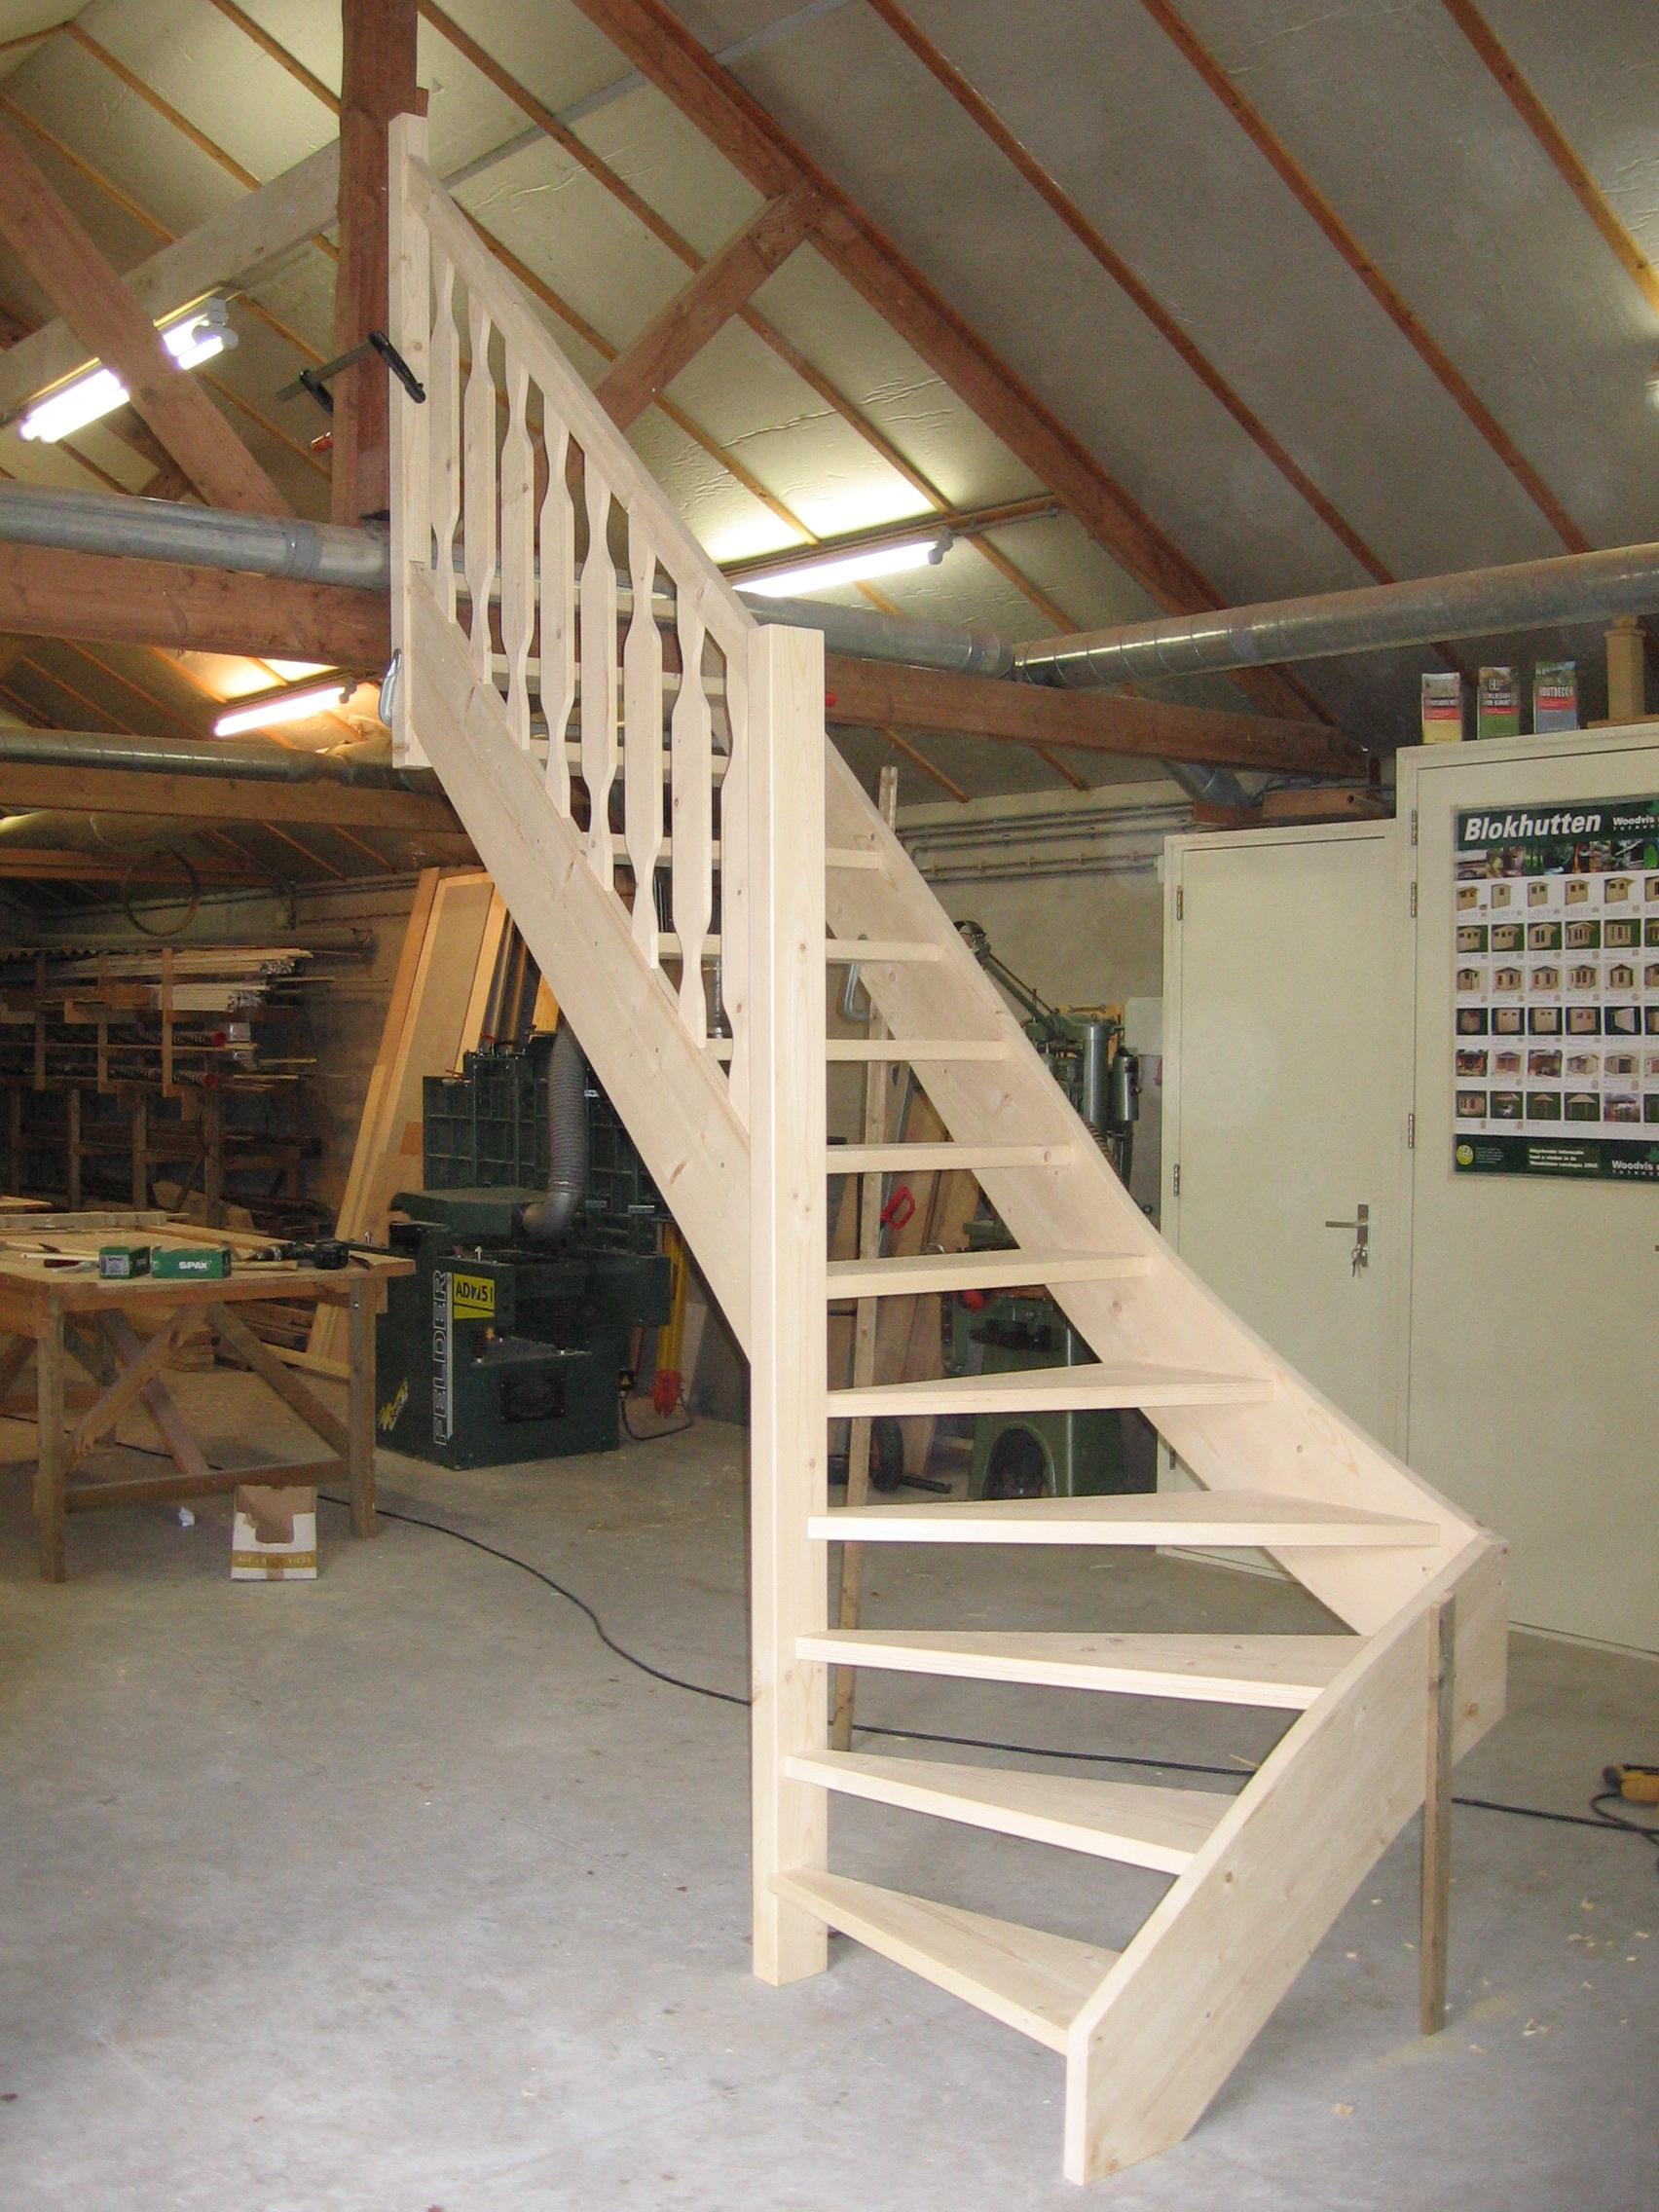 Kwart trap met bewerkte spijlen evert van den bor v o f for 2 kwart trap